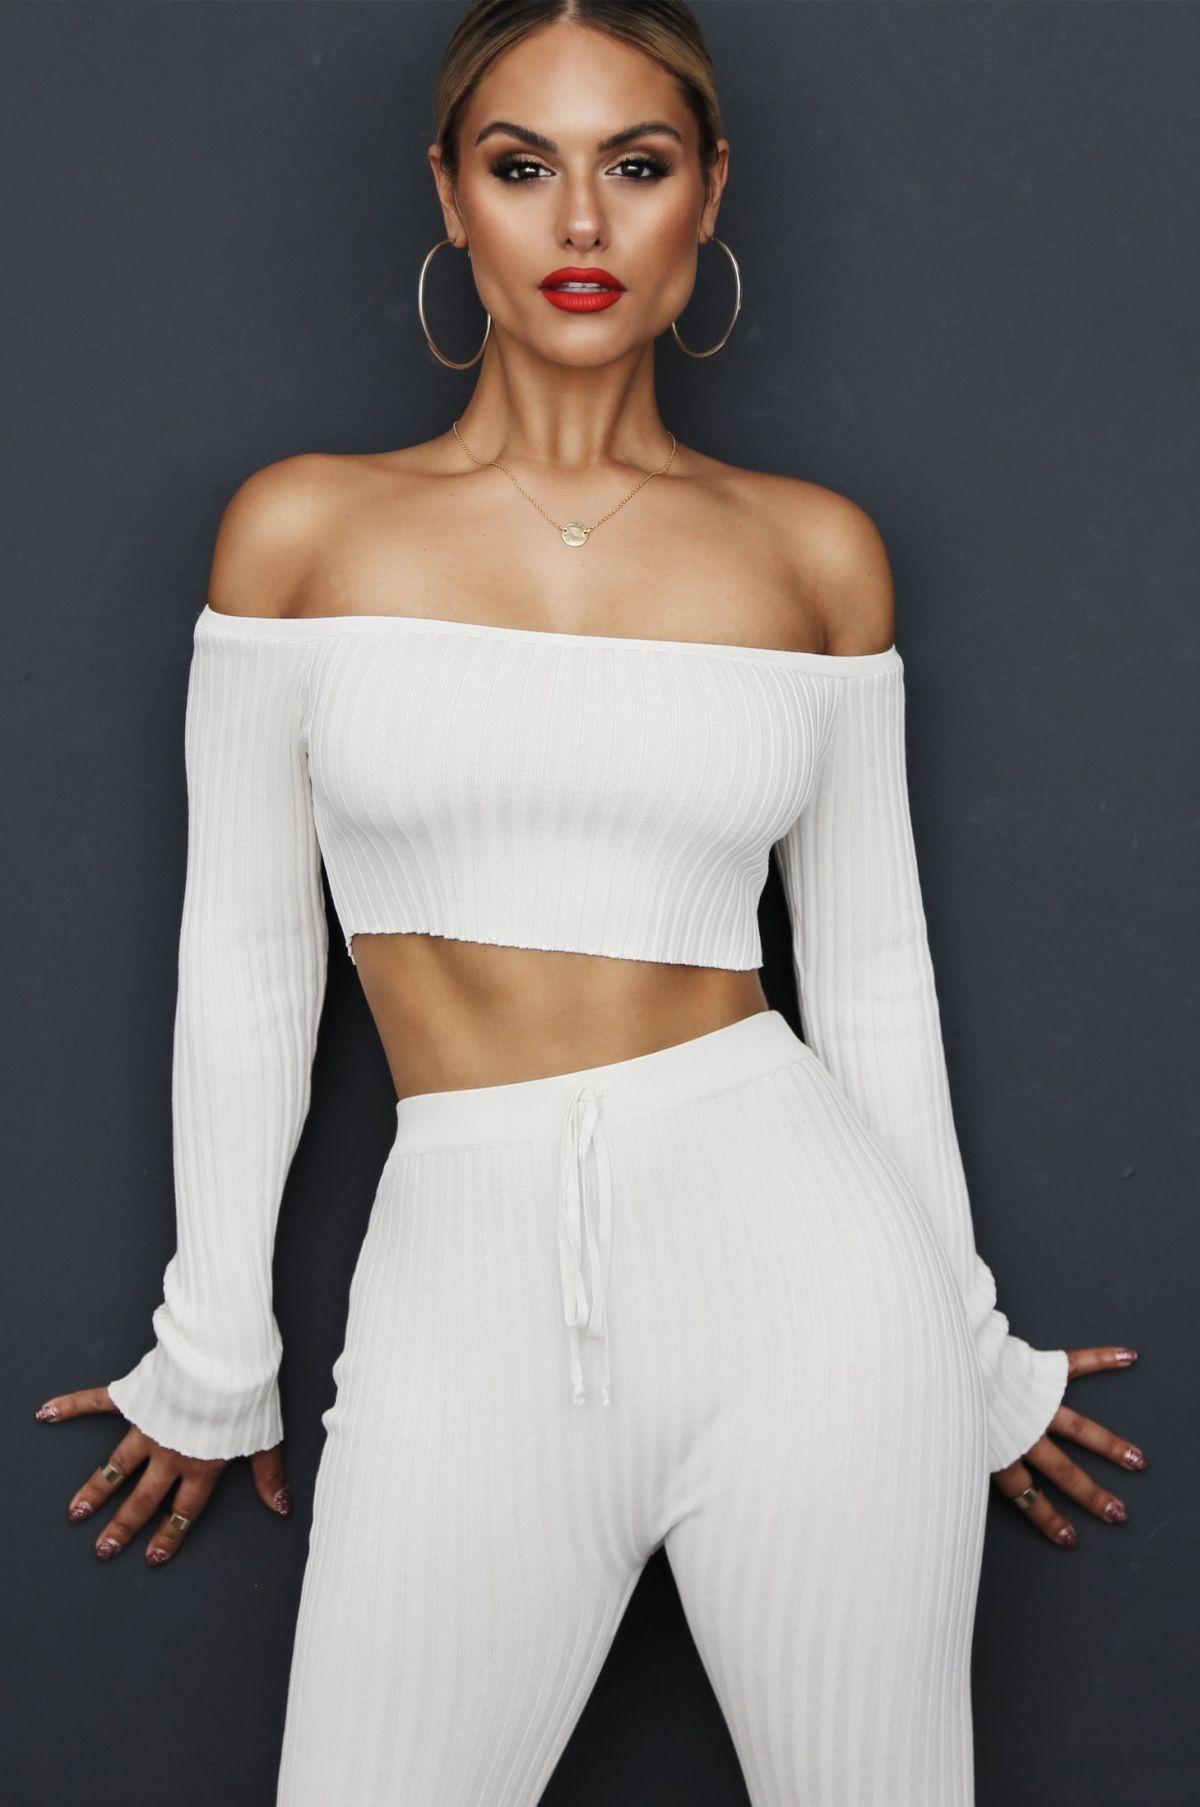 Pia toscano jluxlabel fallin for pia fashion line 2019 - 2019 year